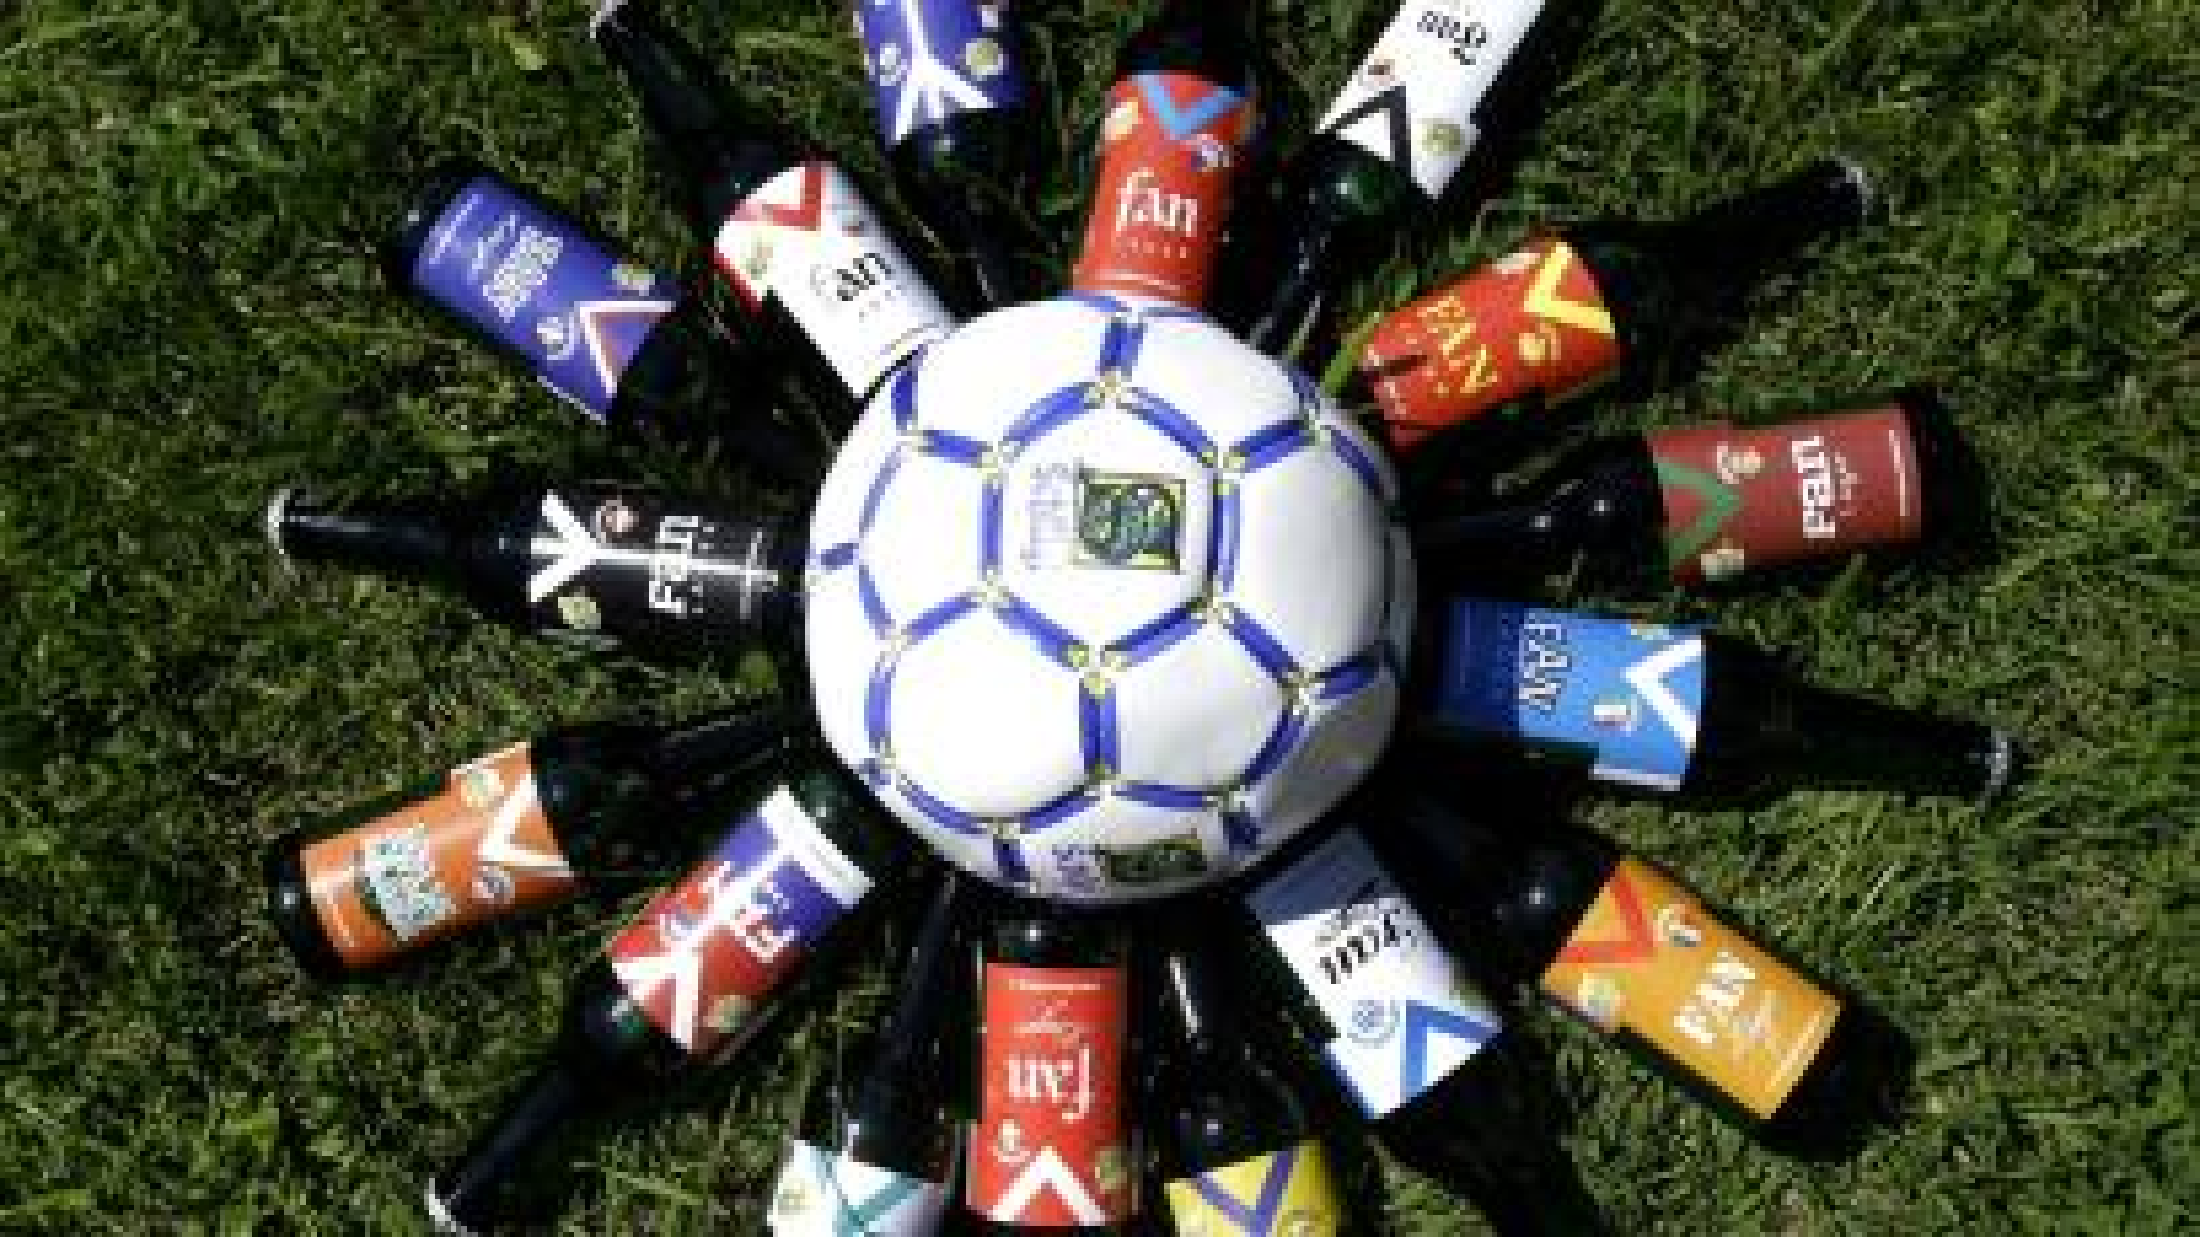 Beer is giving 2022 World Cup host Qatar a headache